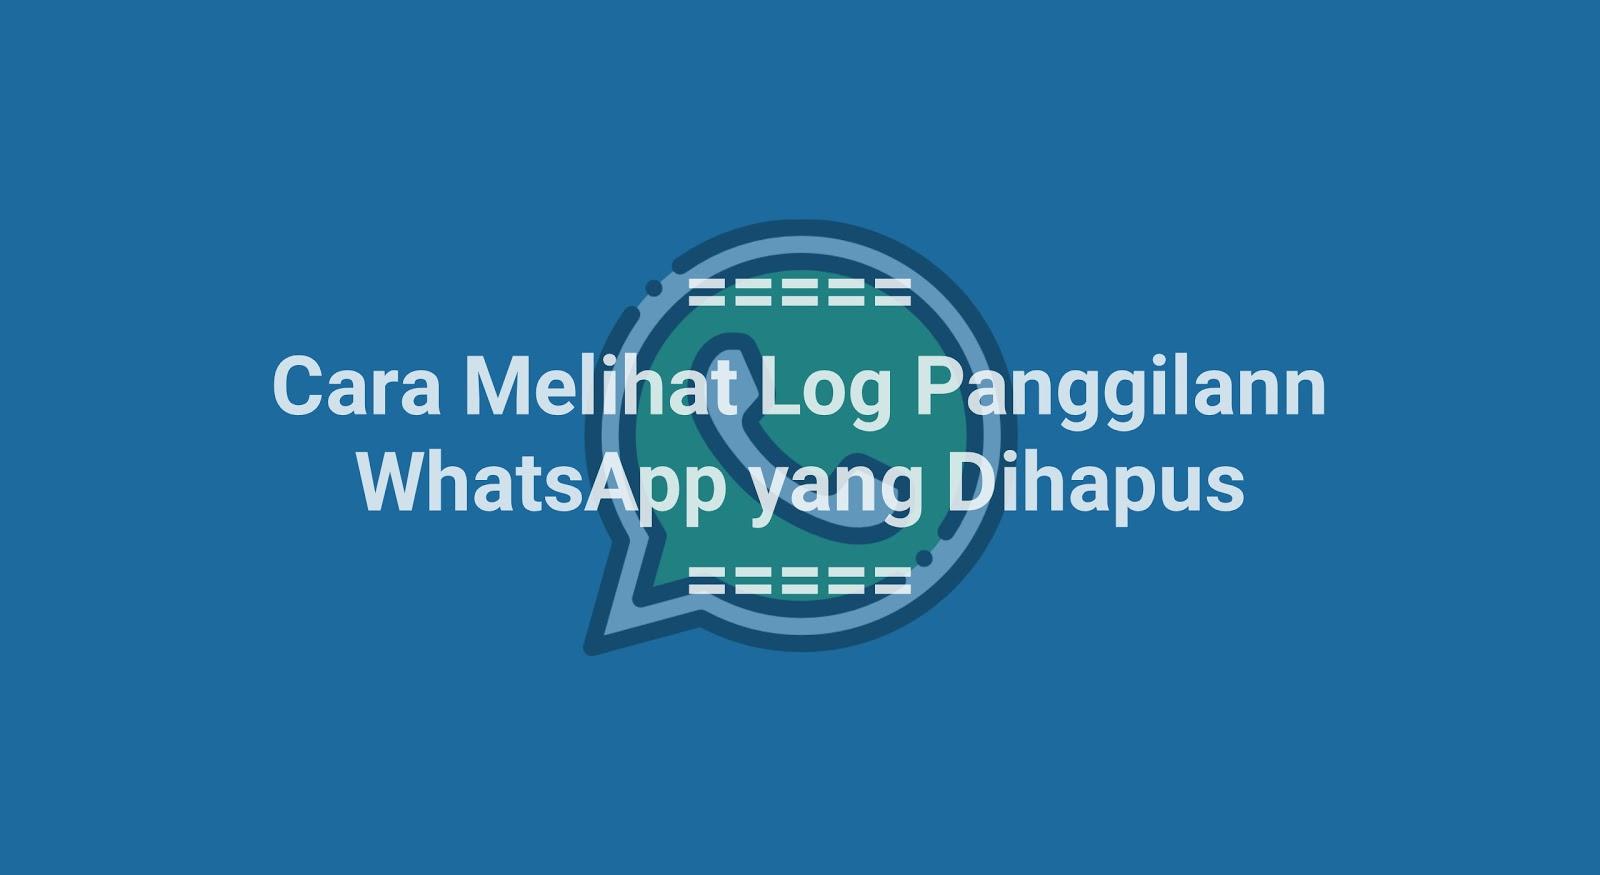 Cara Melihat Log Panggilan WhatsApp yang Dihapus